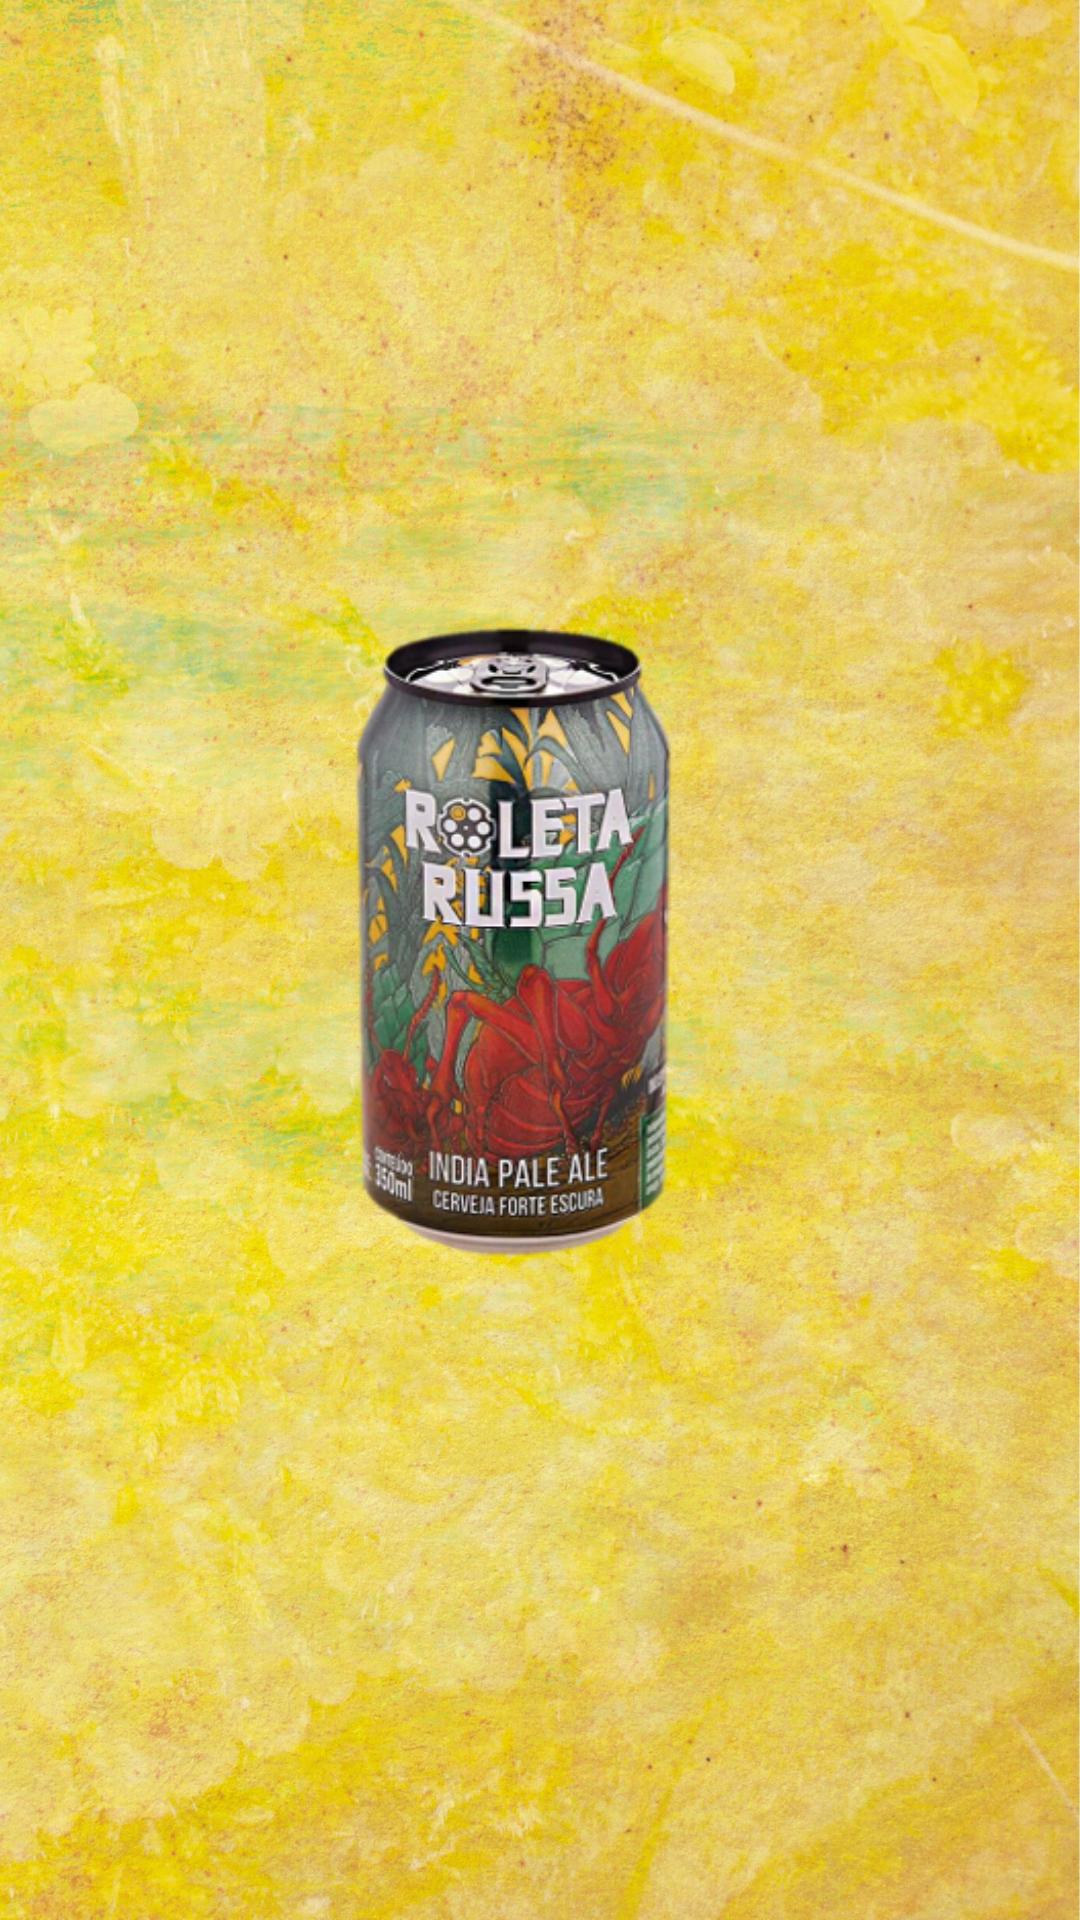 Roleta Russa India Pale Ale IPA